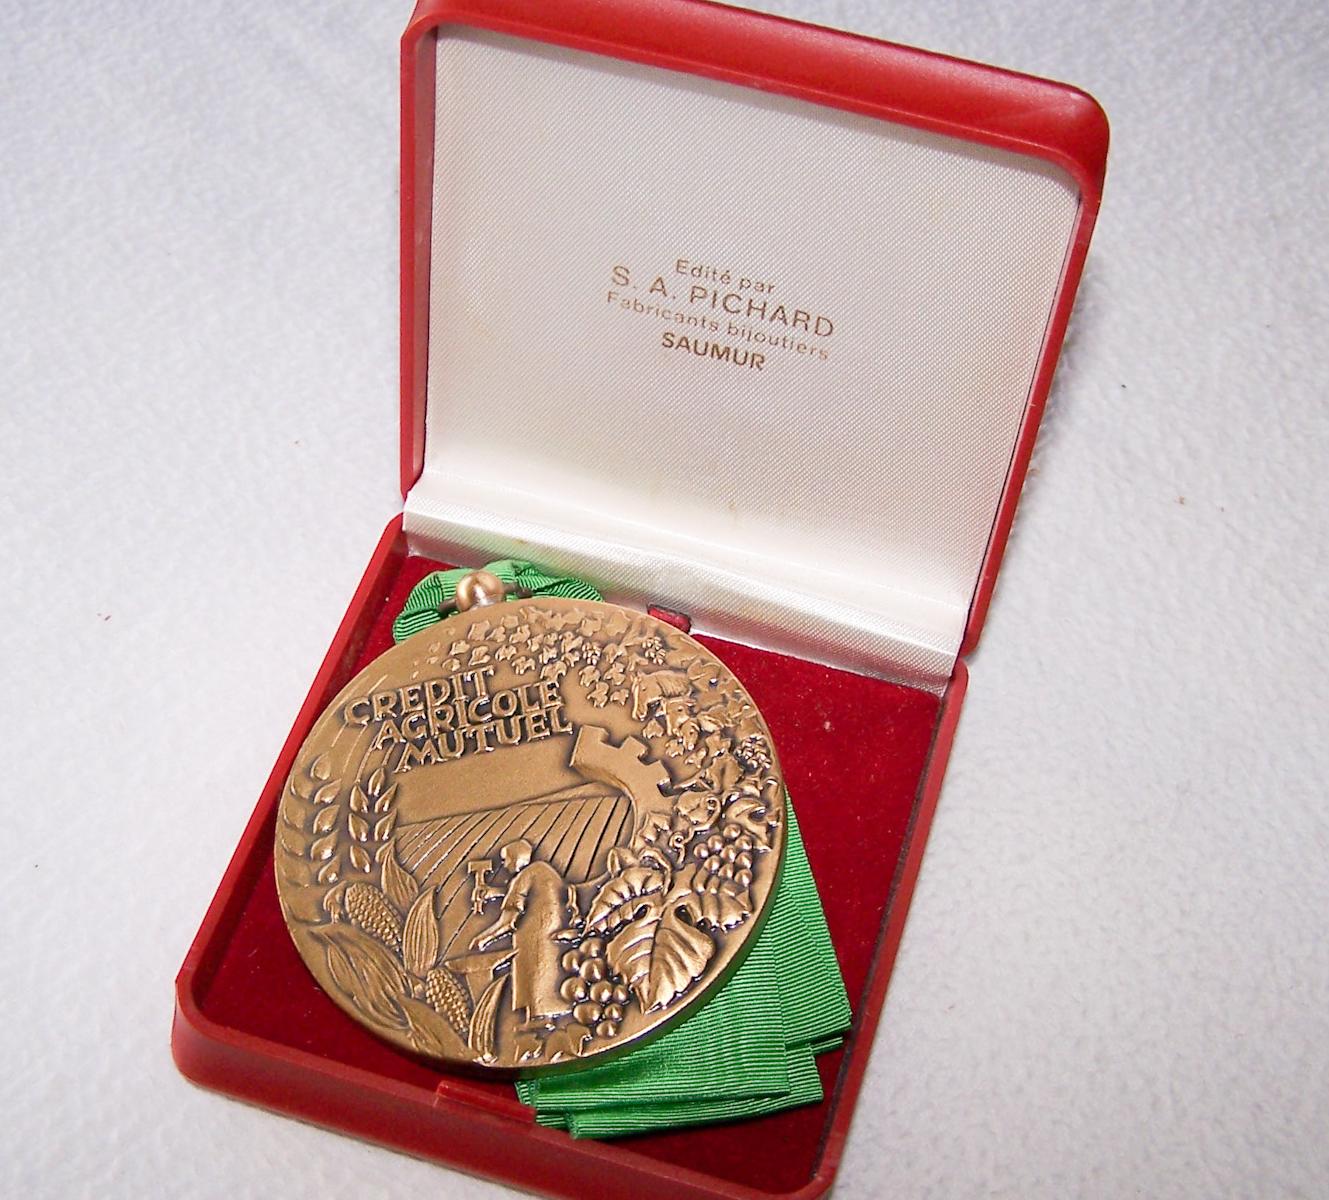 Hobby - Münzen & Medaillen - Bronze-Medaille Credit Agricole Mutuel Loir & Cher - Etui geöffnet